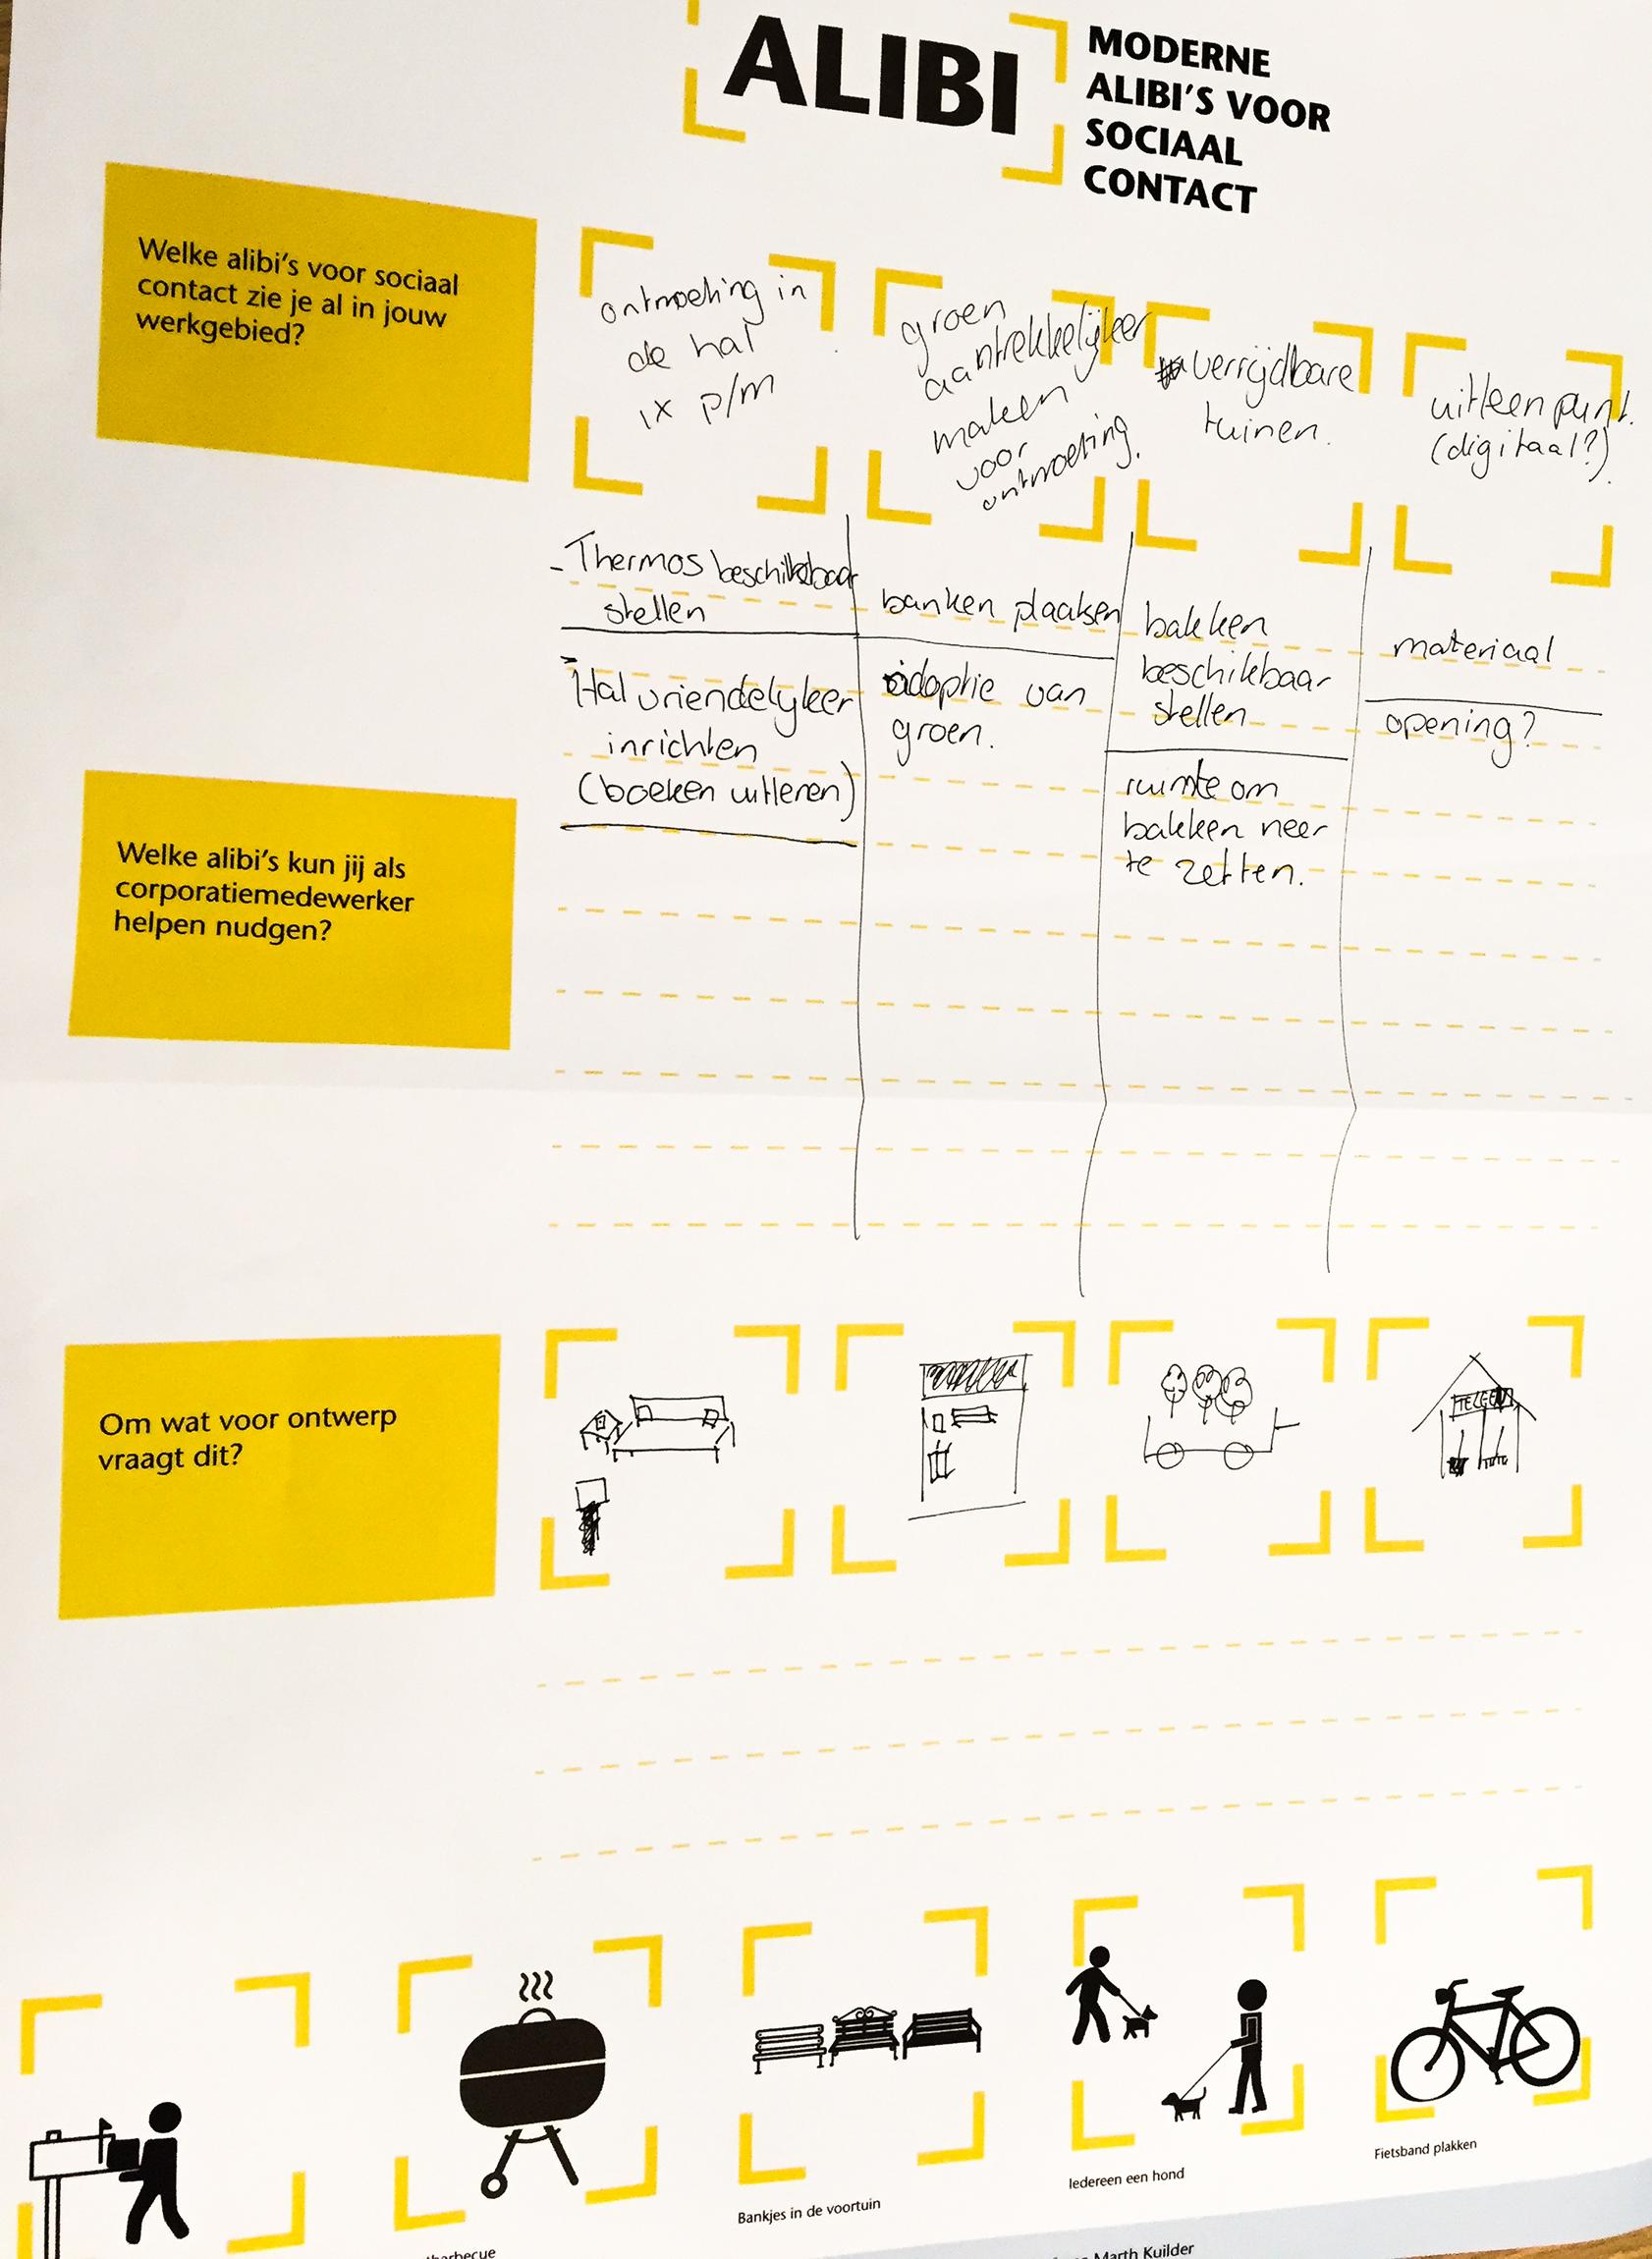 echter-ontwerp-social-design-woningbouw-servicedesign-workshops008